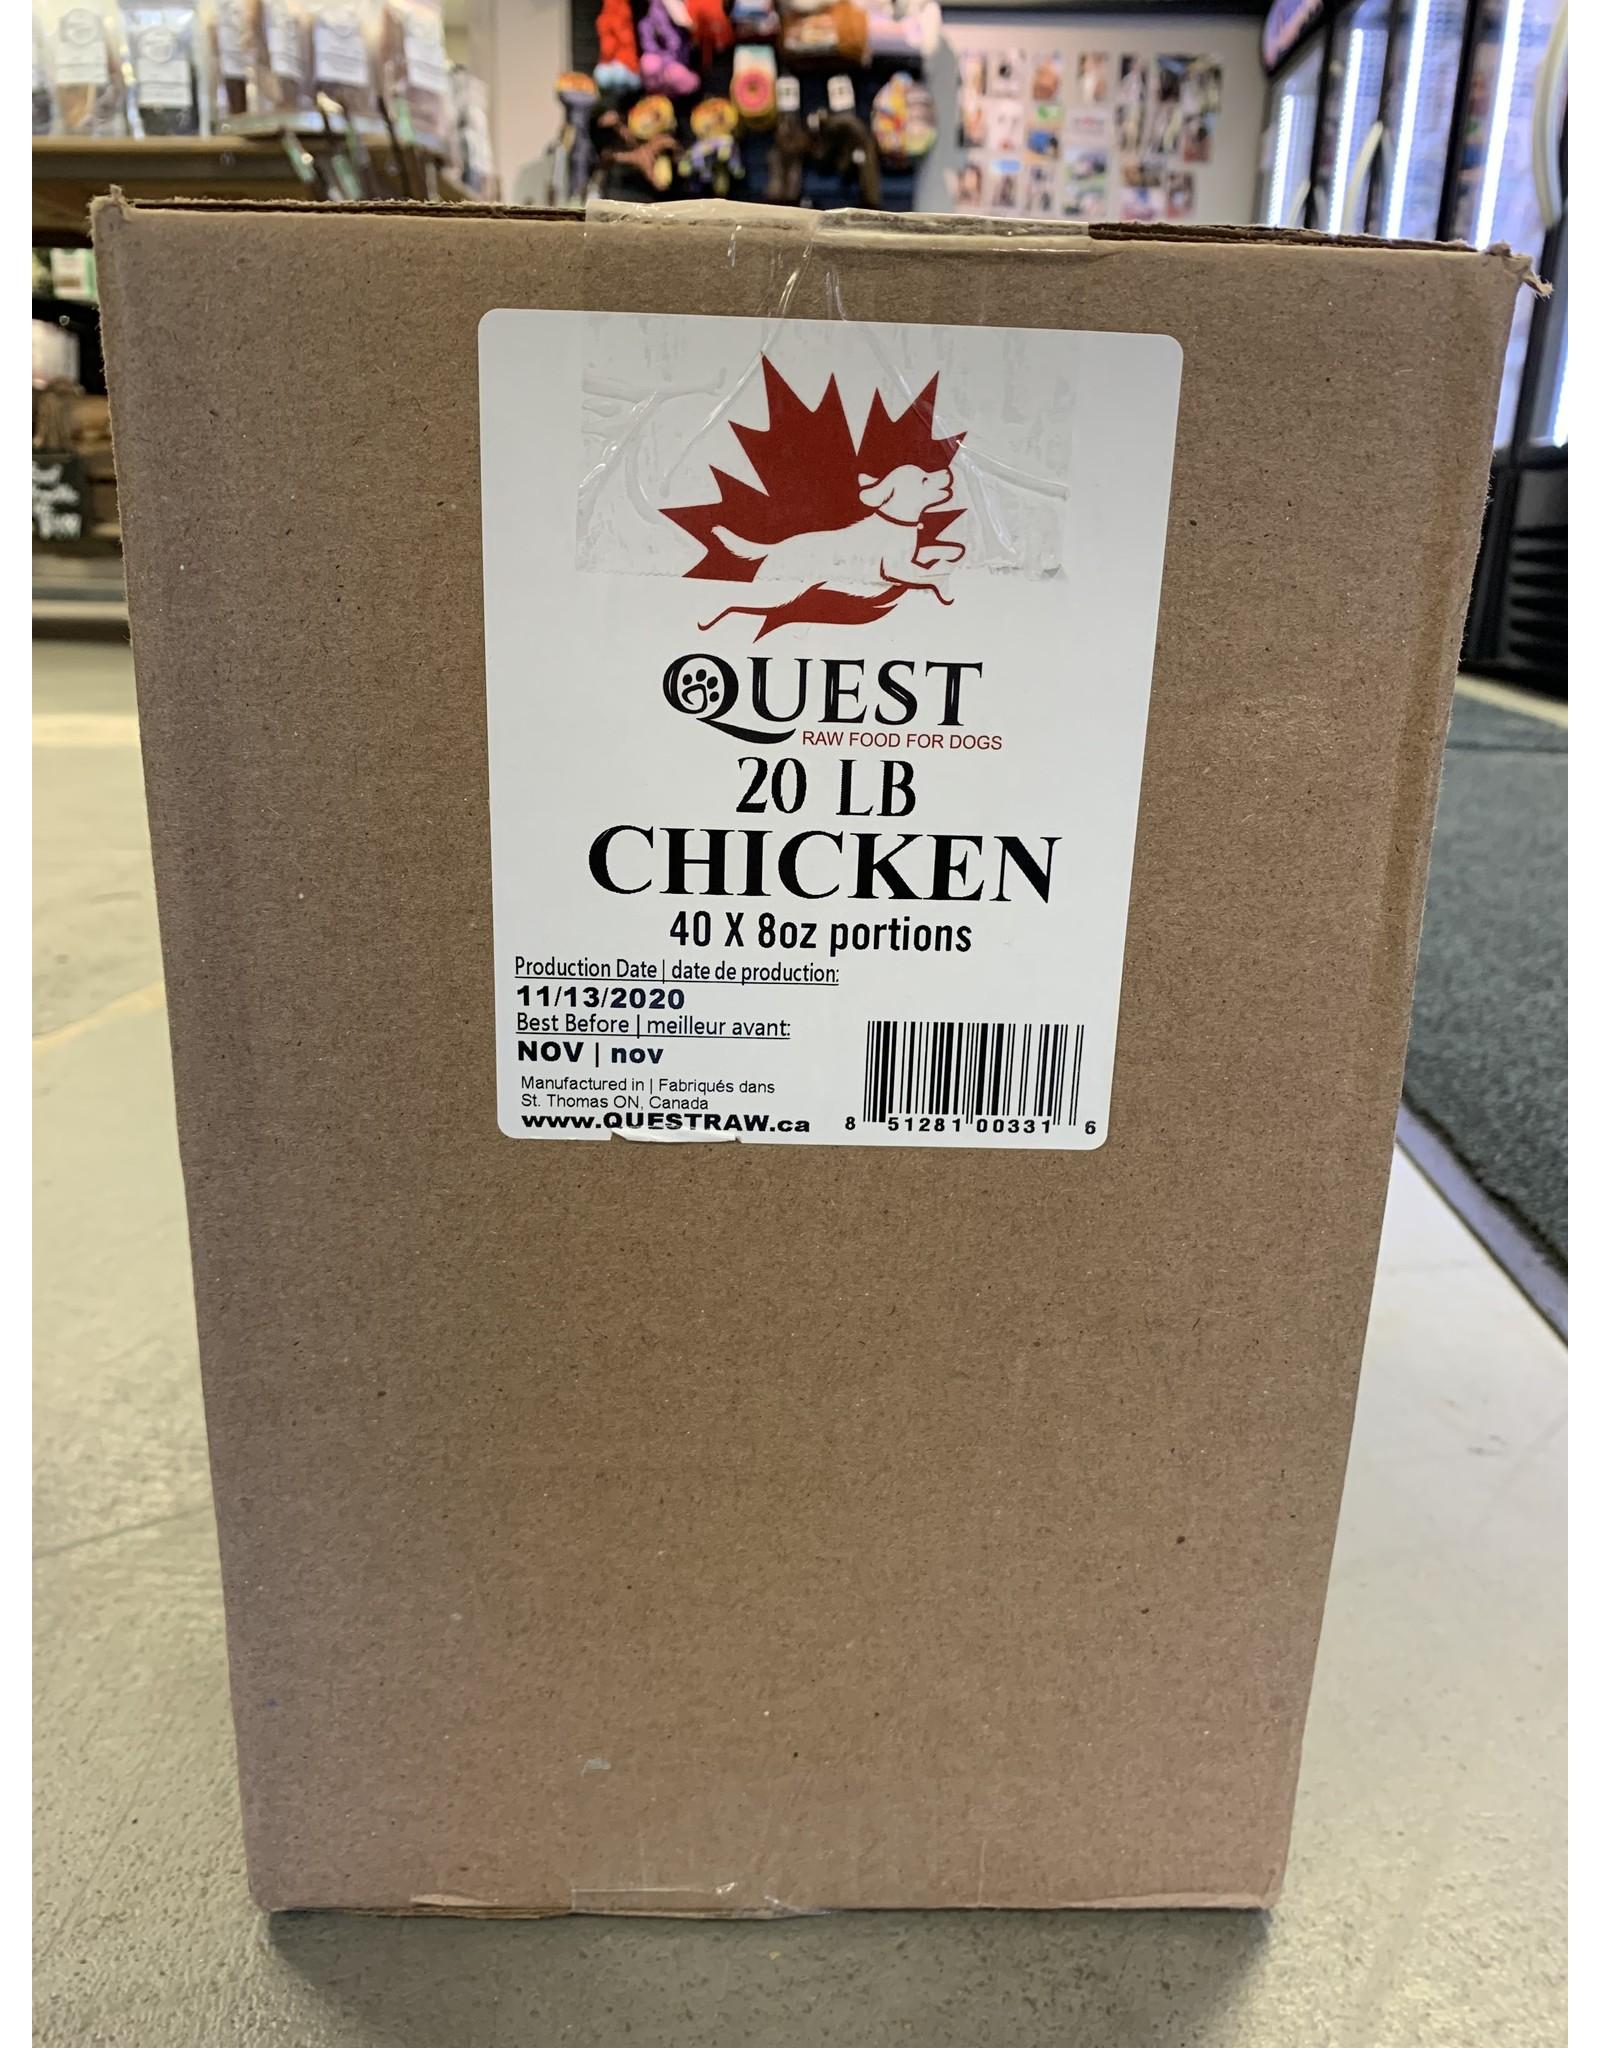 Quest Quest - 20LB - Chicken